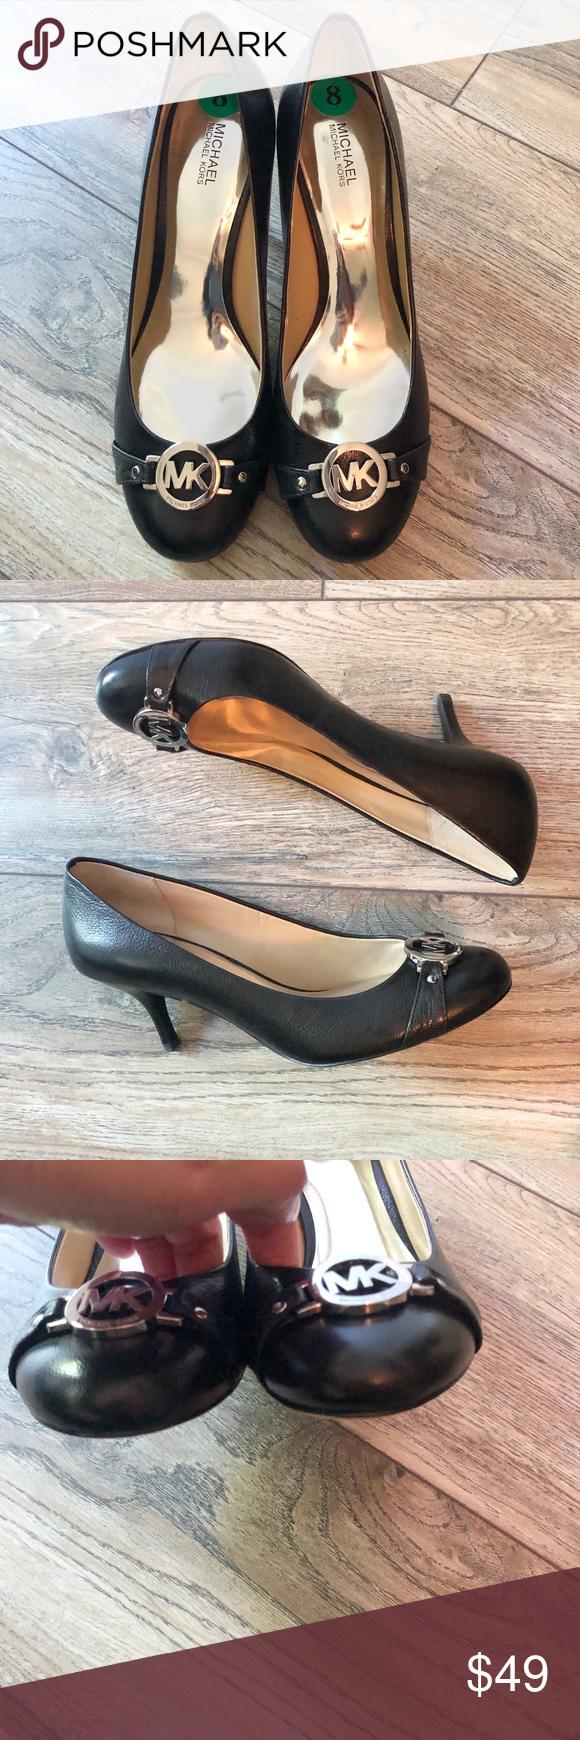 Michael Kors Size 8 Logo Pumps Michael kors shoes heels